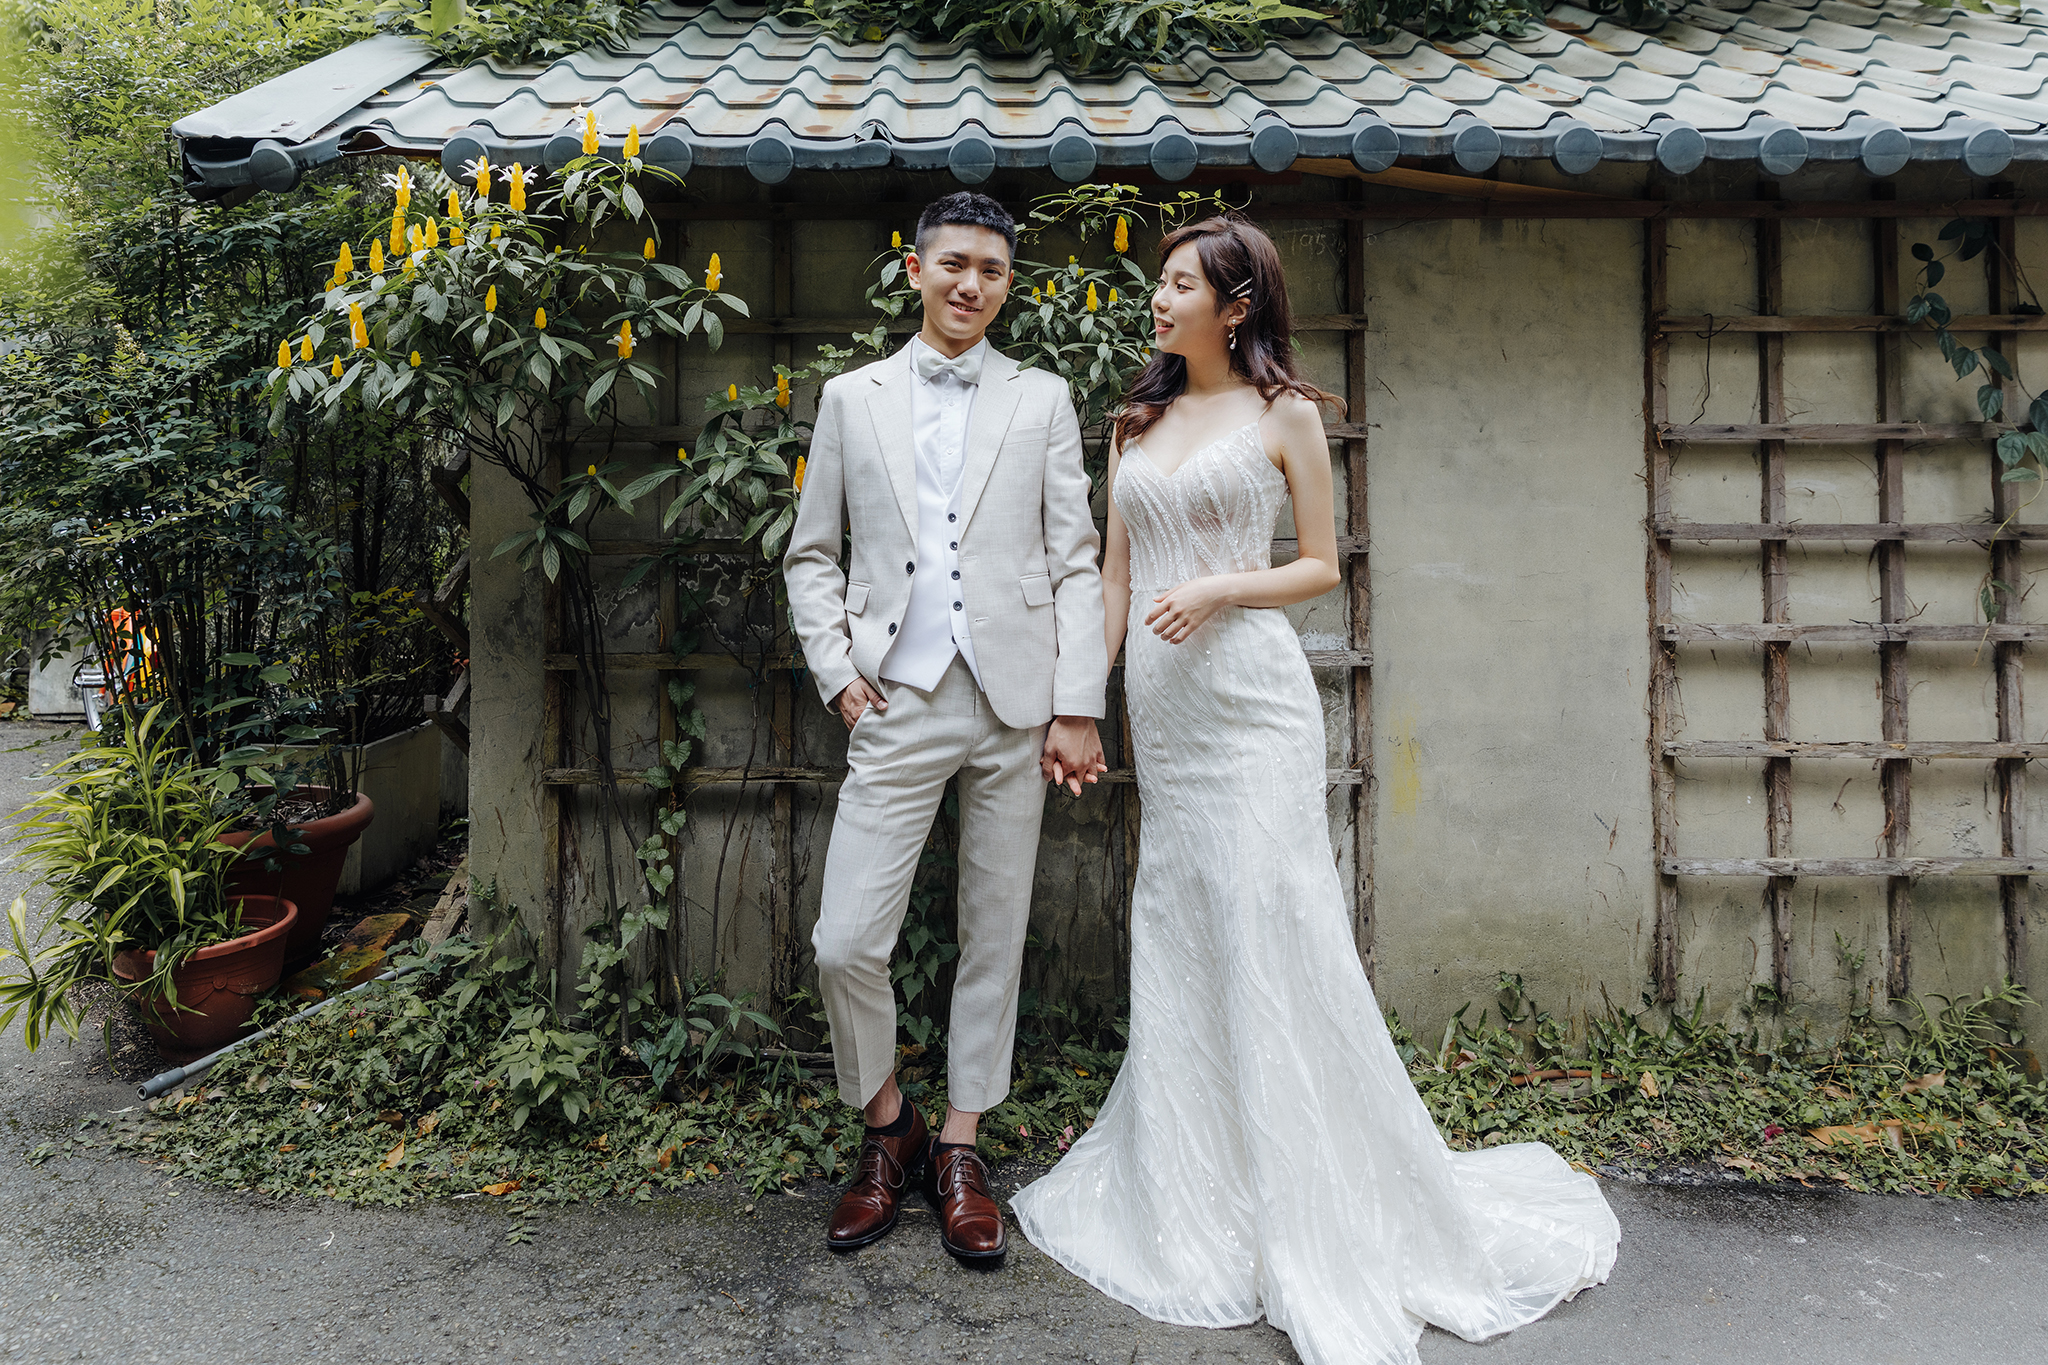 47985624351 cdf90cf548 o - 【自主婚紗】+Jared & Arina+